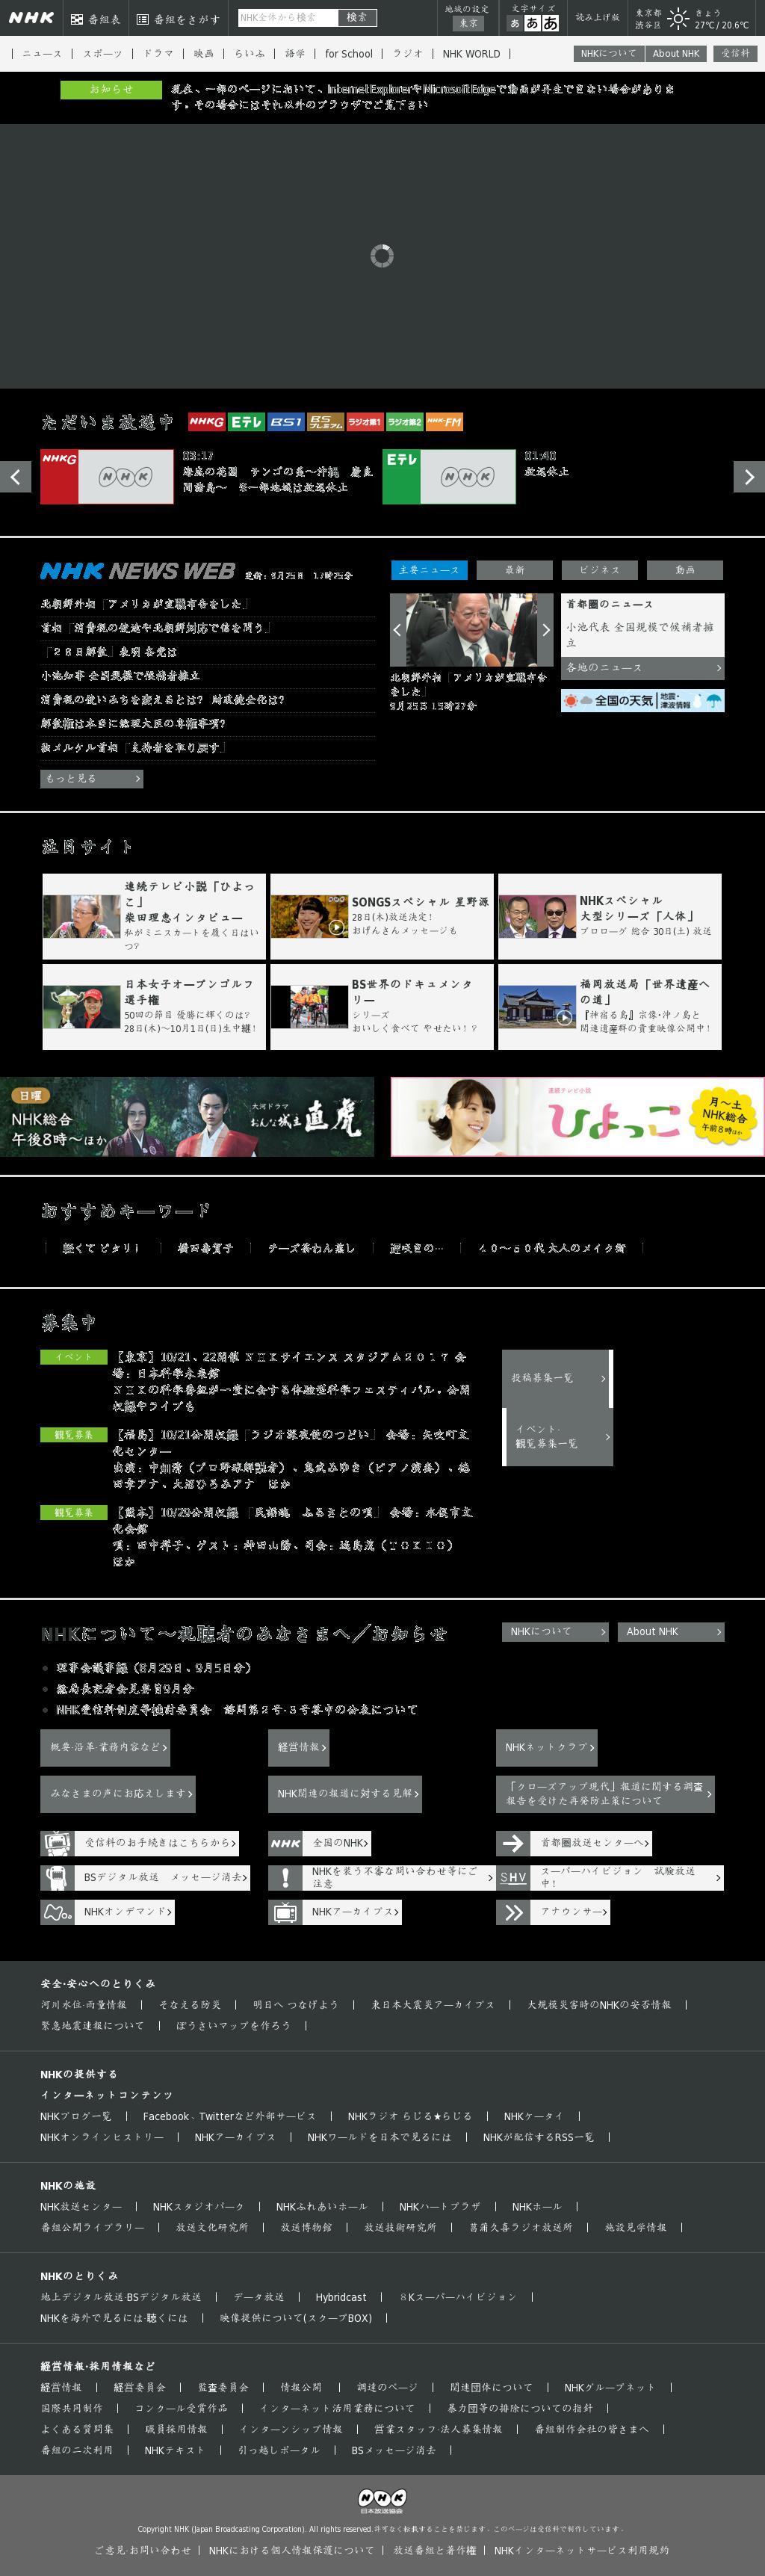 NHK Online at Monday Sept. 25, 2017, 6:23 p.m. UTC